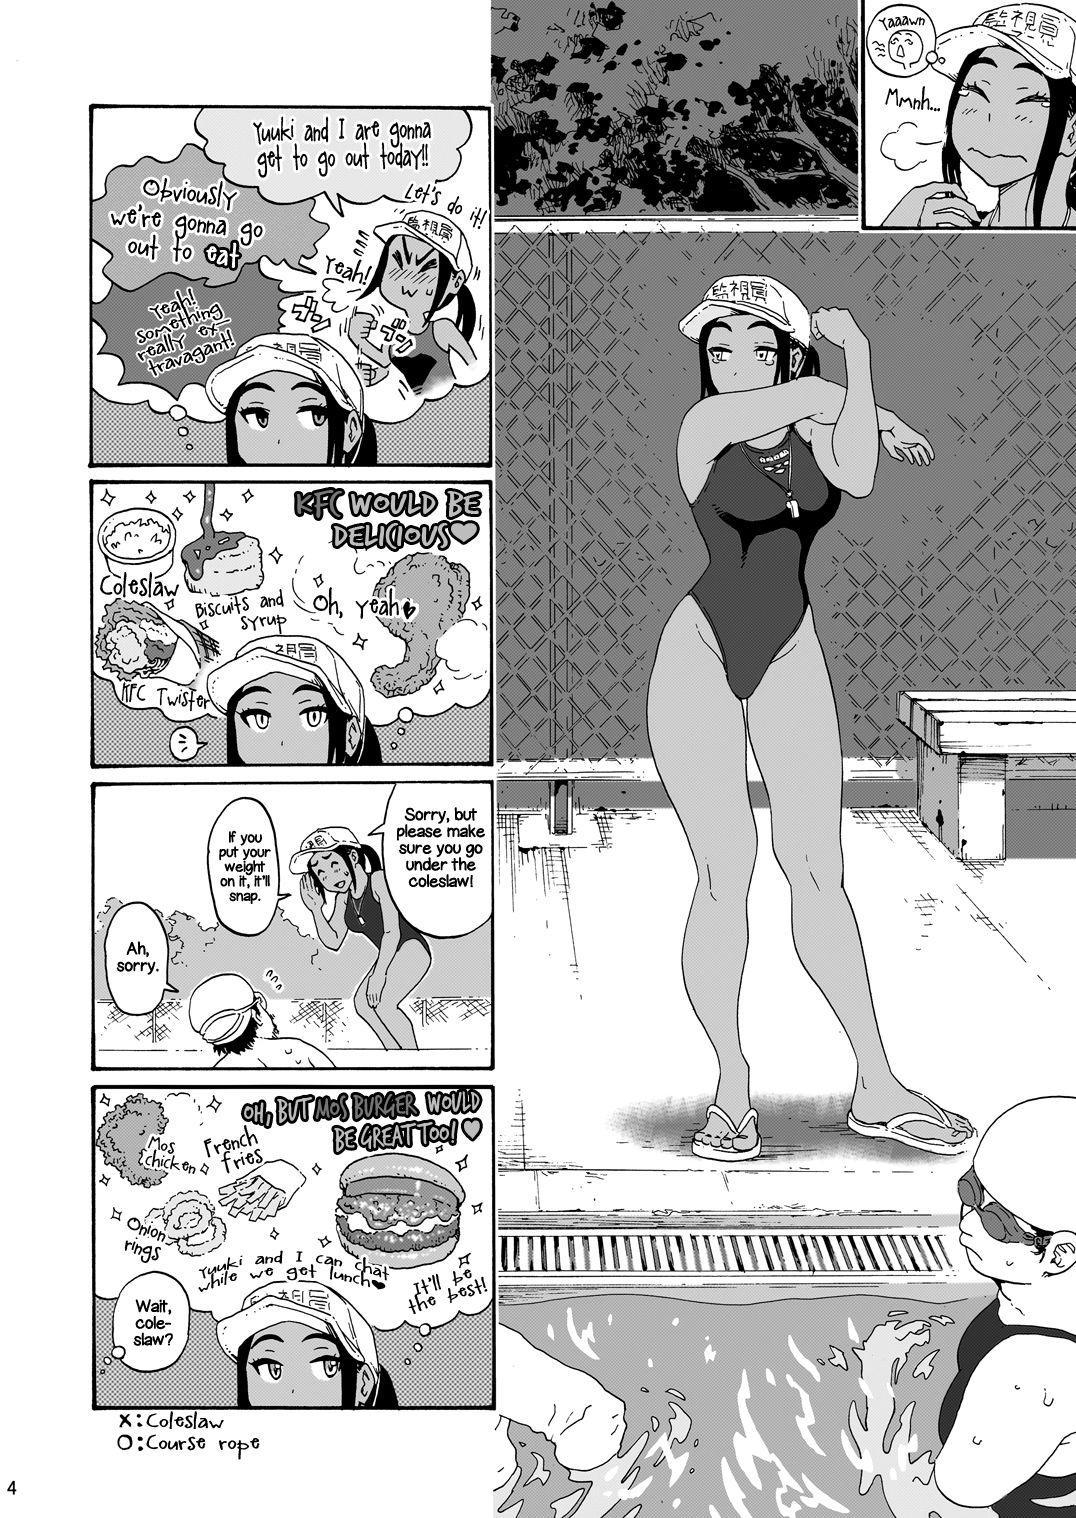 [Amazake Hatosyo-ten (Yoshu Ohepe)] Aah~ Hayaku H Shitai!! (Kana-san wa Pool no Kanshiin) | I Wanna Do Dirty Stuff Already! (Kana, the Pool Lifeguard) [English] [Rotoscopic] [Digital] 3